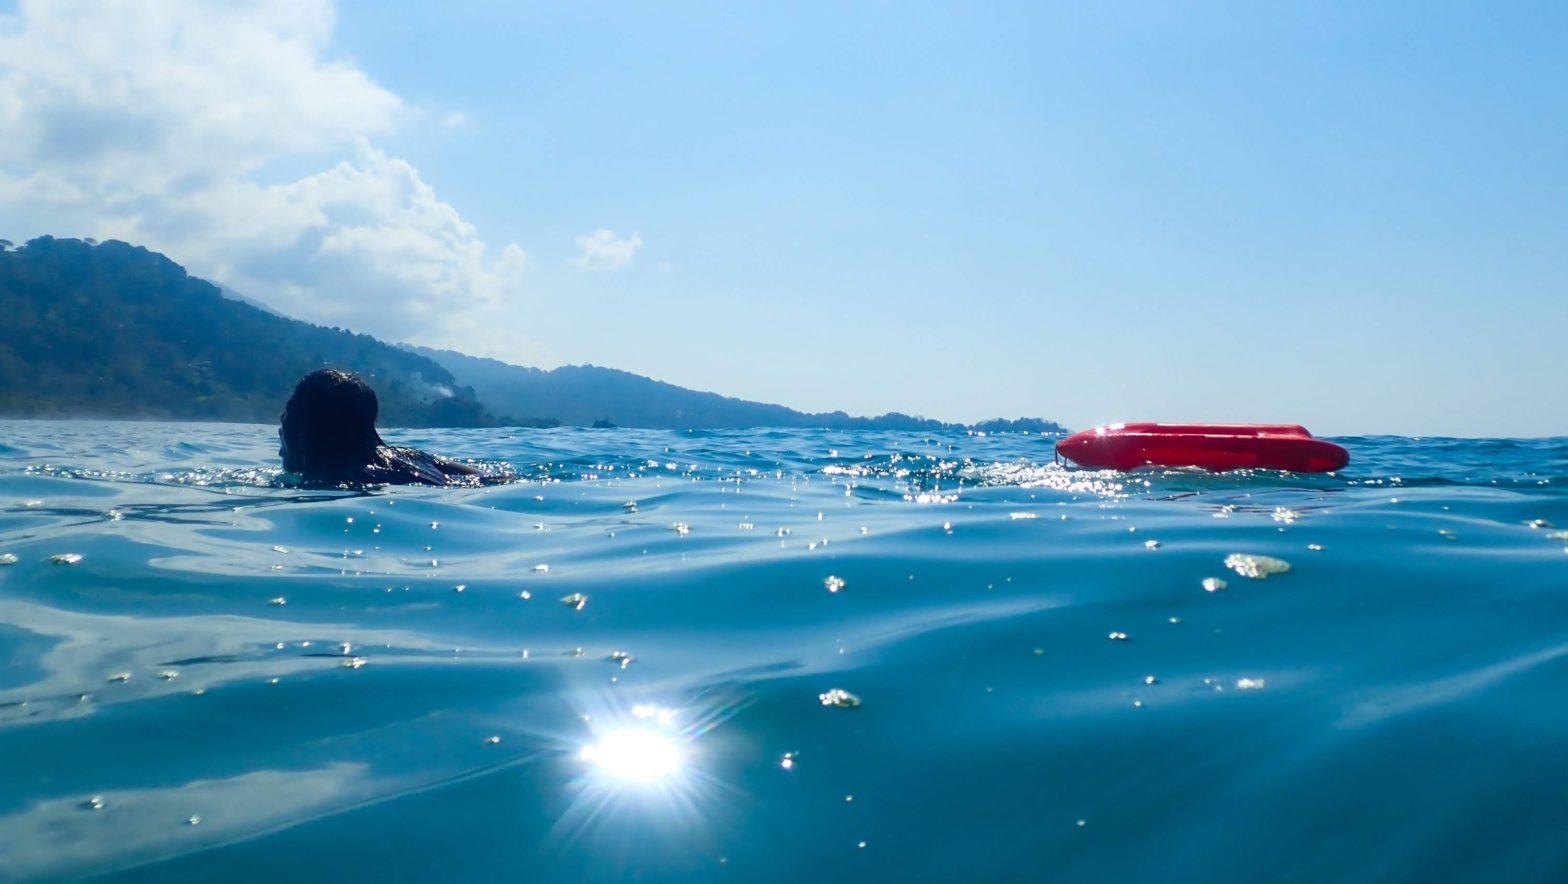 Lifeguards swimming - guardavidas nadando